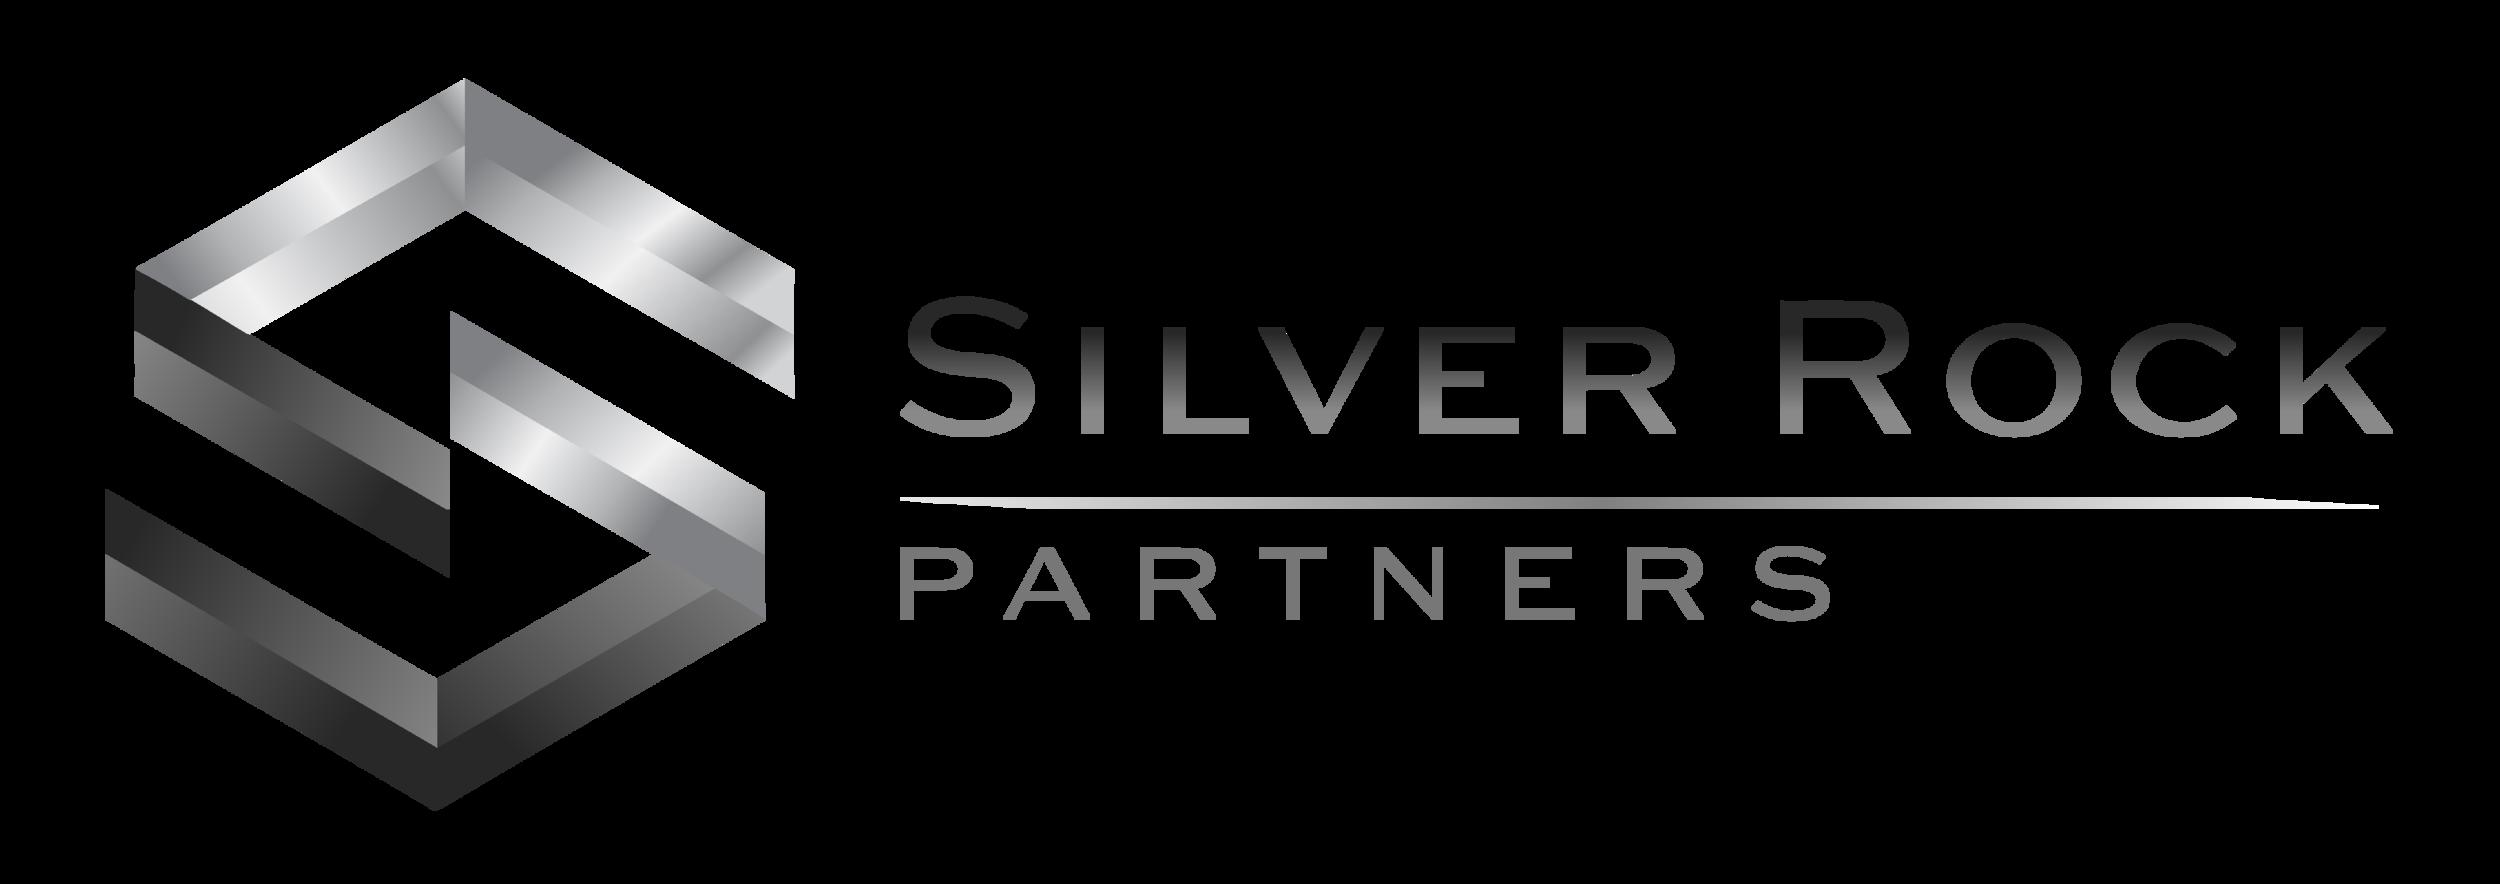 SilverRock-LogoNoHue-01.png